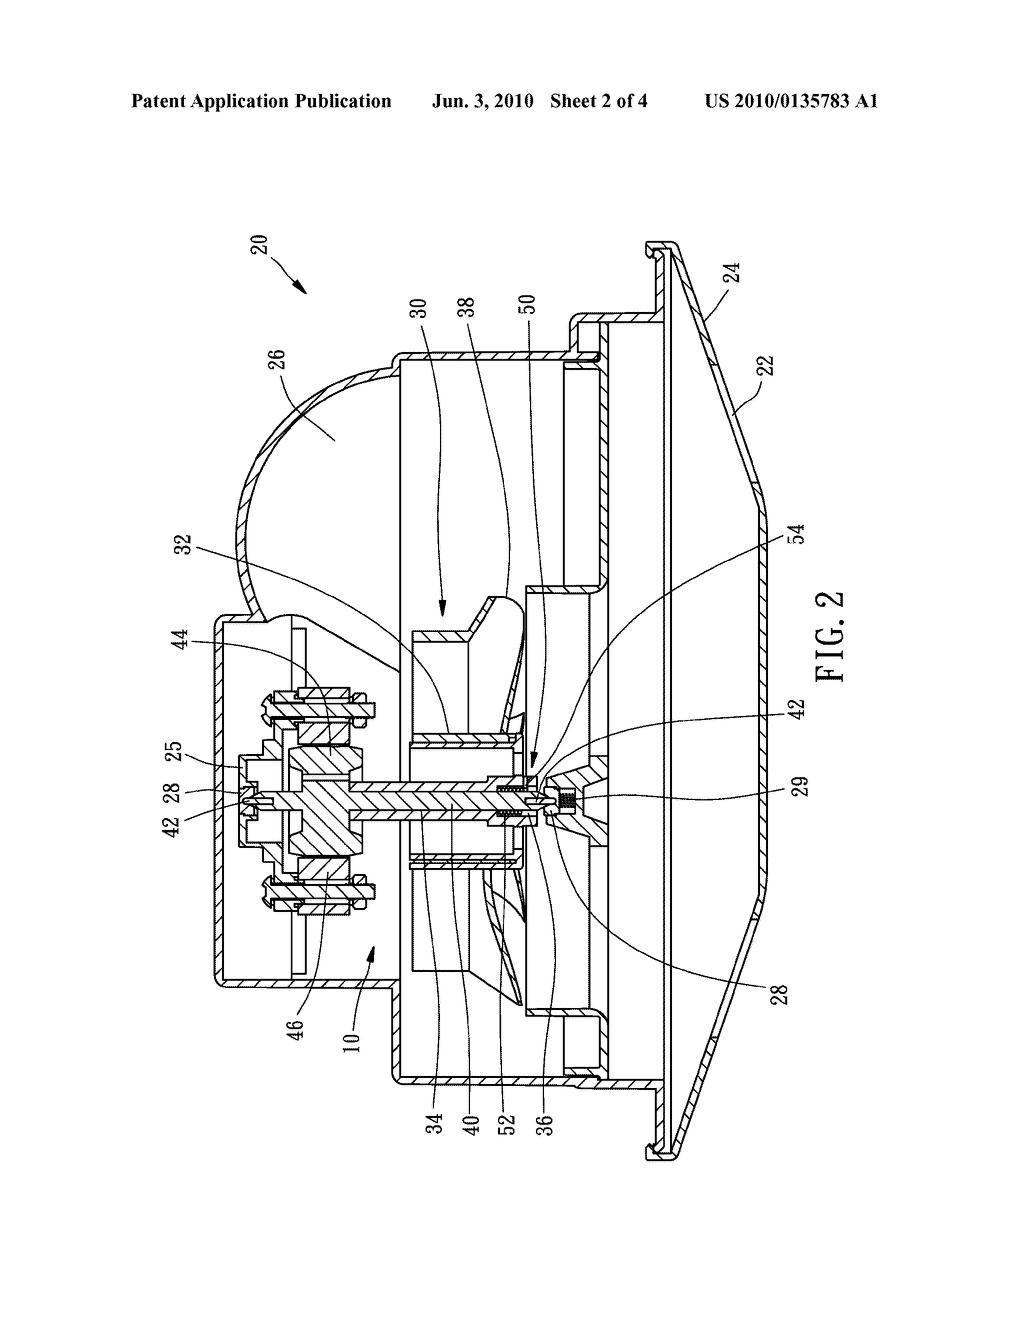 2004 subaru outback exhaust system diagram bridged mono wiring h6 3 engine 6 cylinder